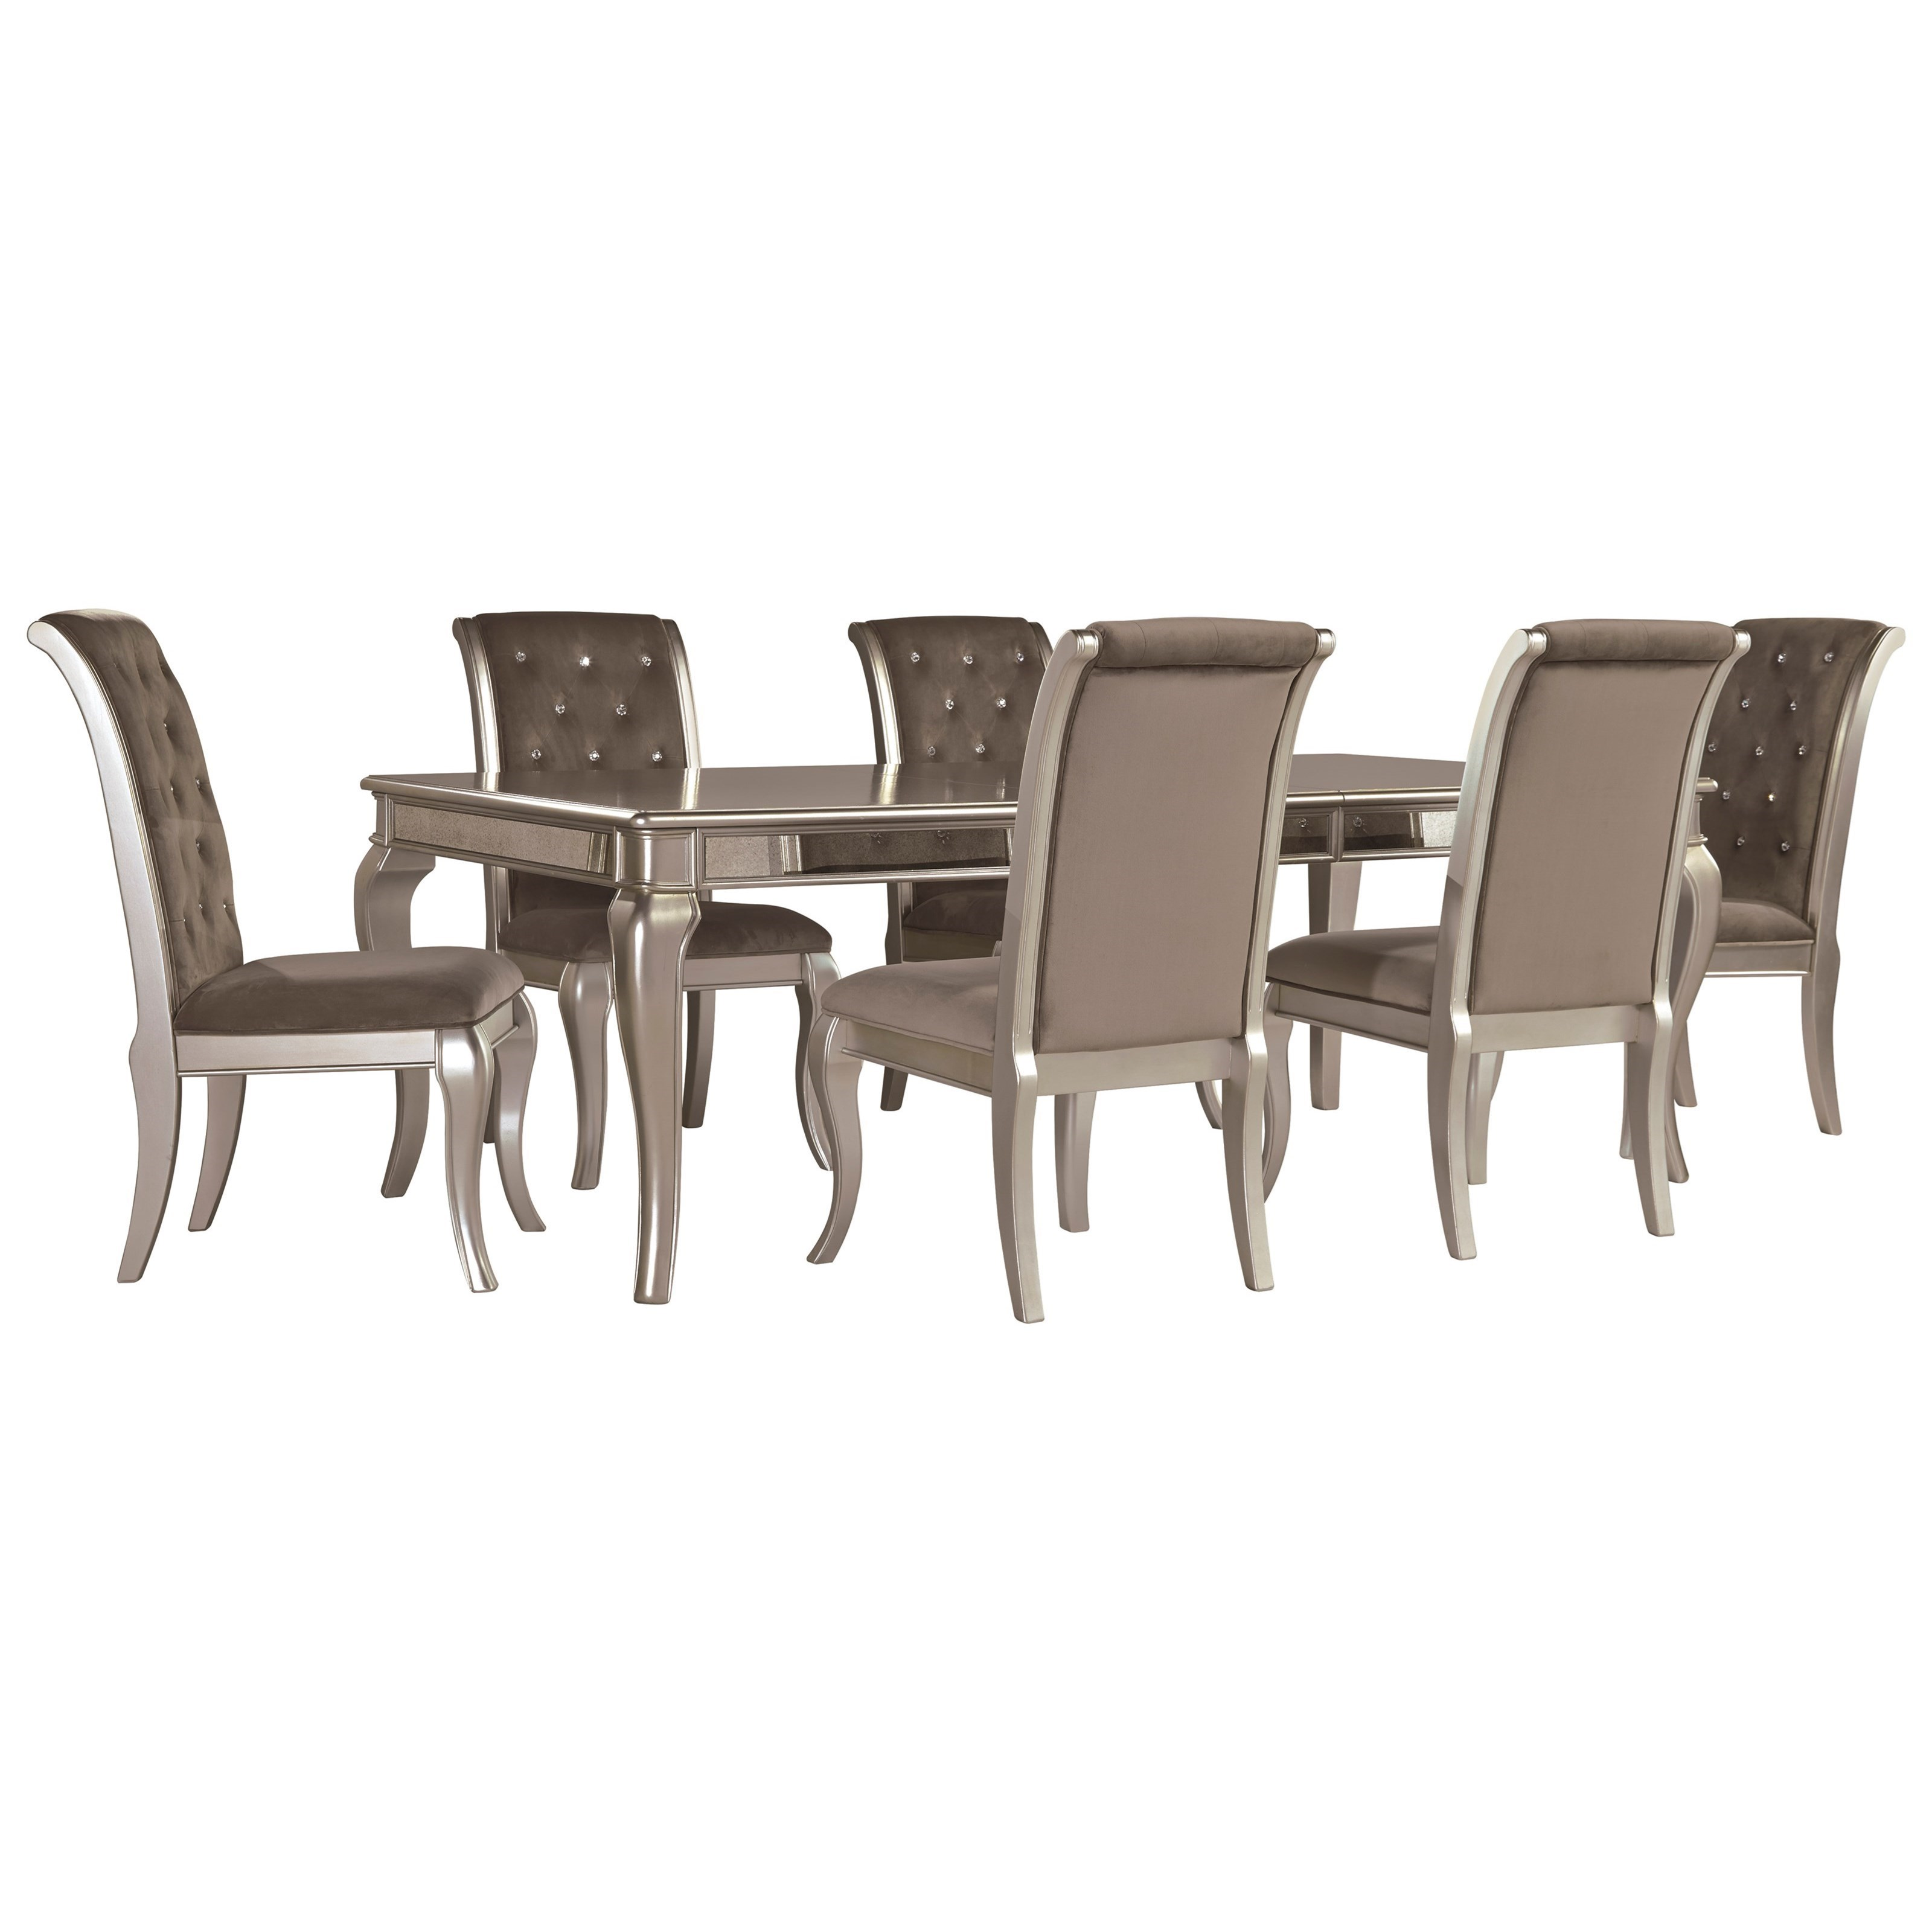 Signature Design by Ashley Birlanny7-Piece Rectangular Dining Table Set ...  sc 1 st  Royal Furniture & Signature Design by Ashley Birlanny Glam 7-Piece Rectangular Dining ...